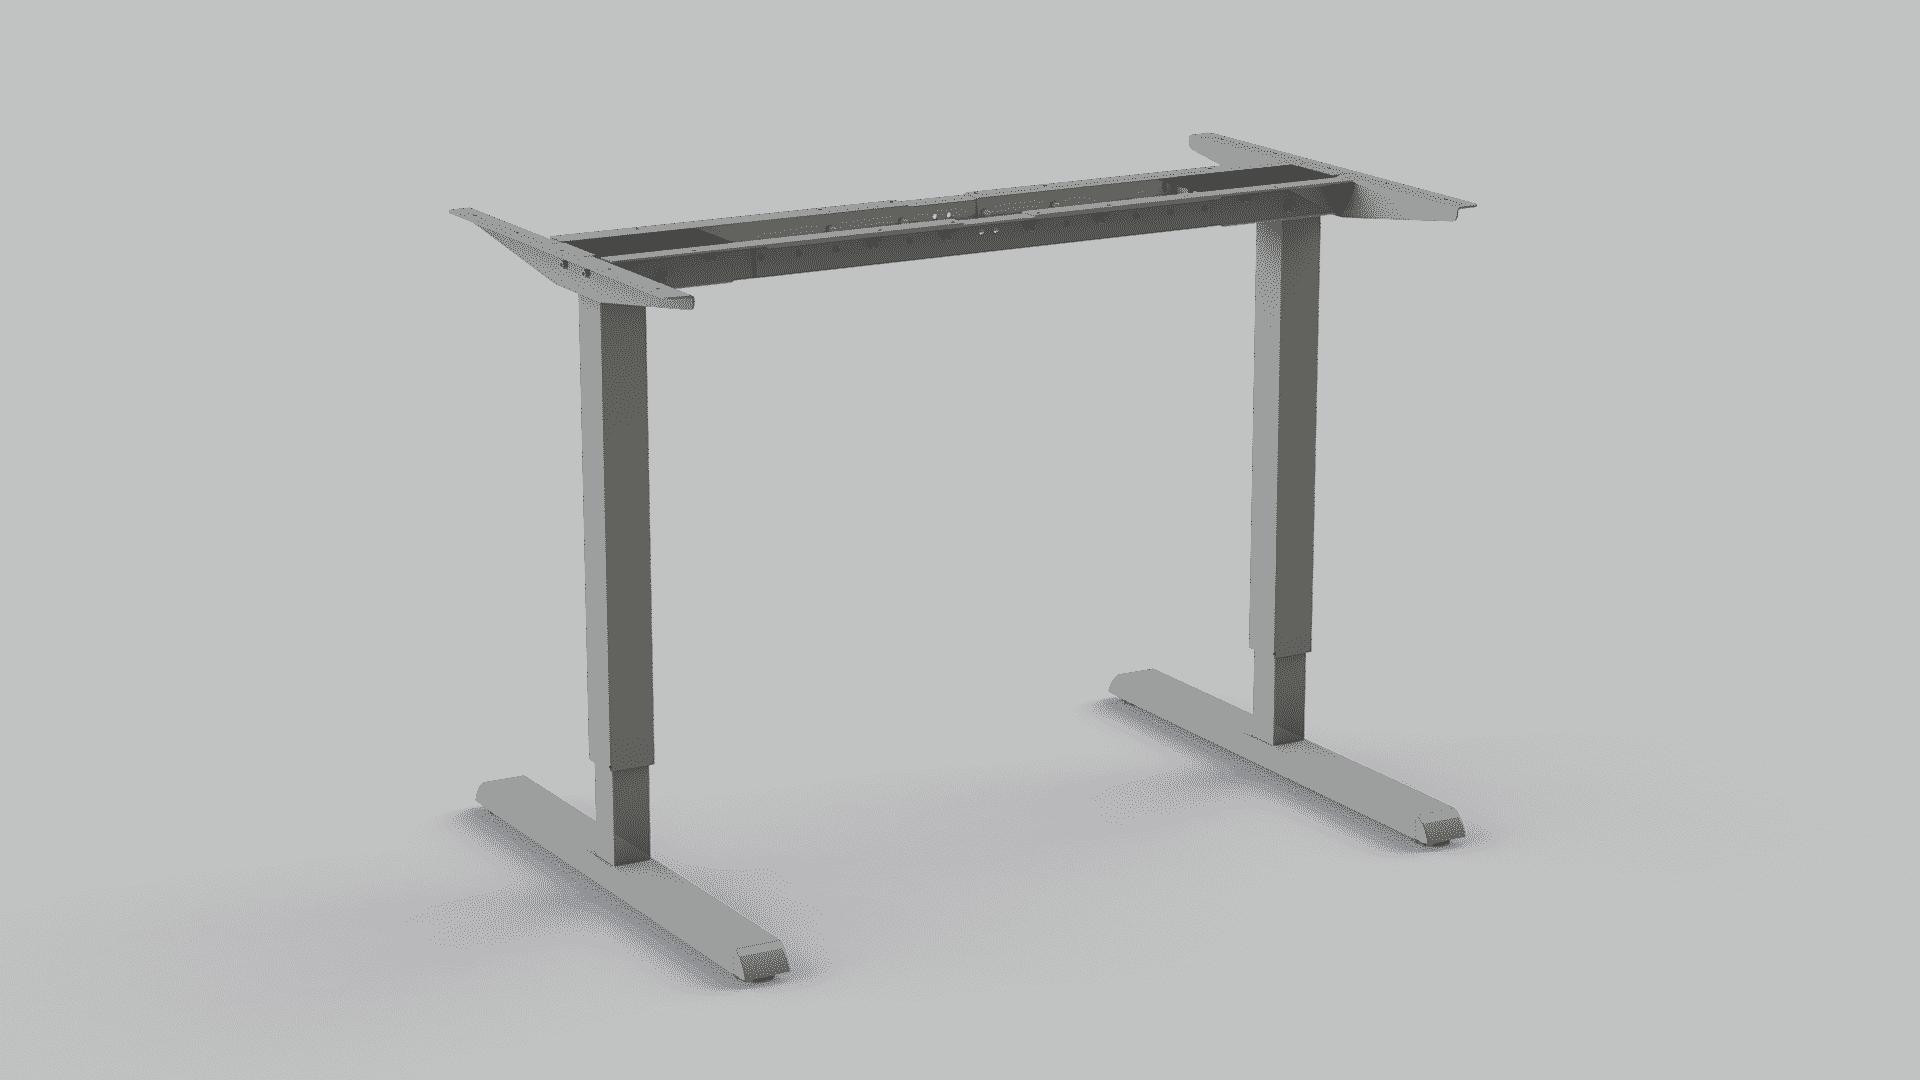 300 SLS Silver height adjustable table